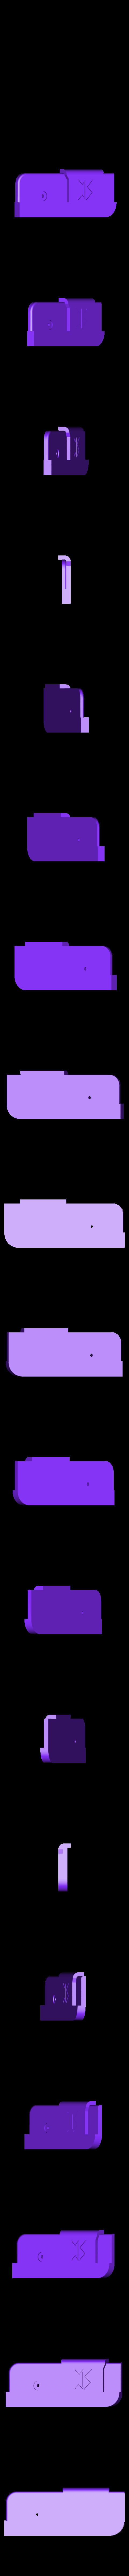 IGun6_GripALT1.stl Download free STL file Phone Gun • 3D printer object, Snorri